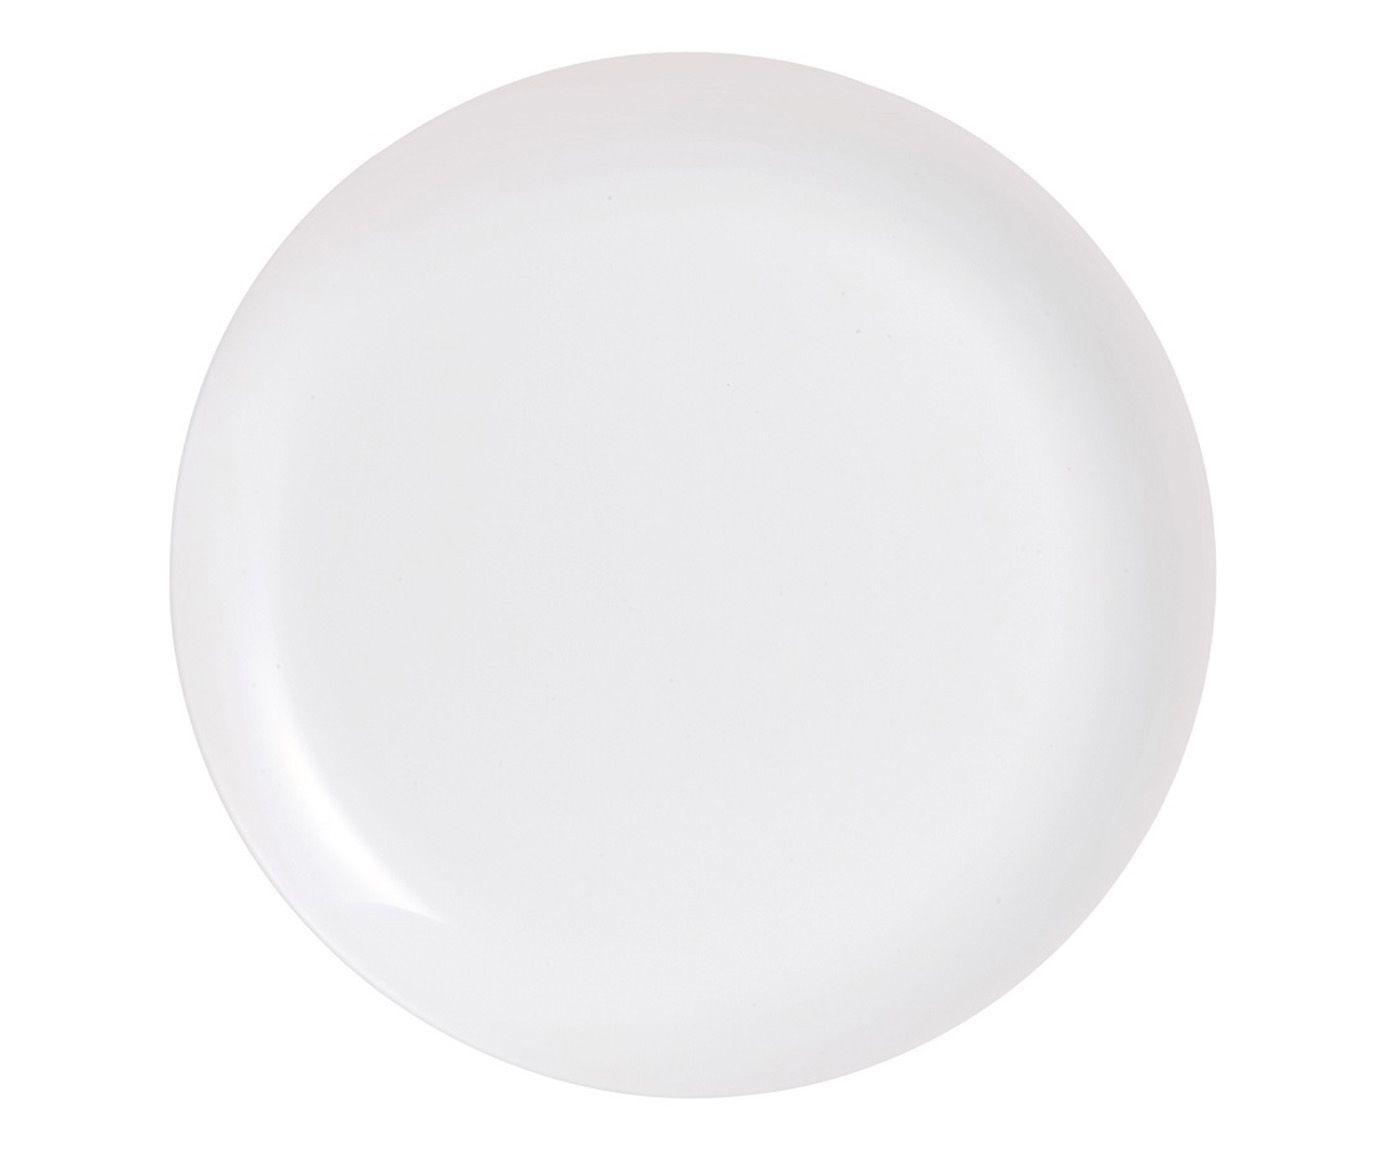 Prato para Sobremesa Diwali - 19cm | Westwing.com.br